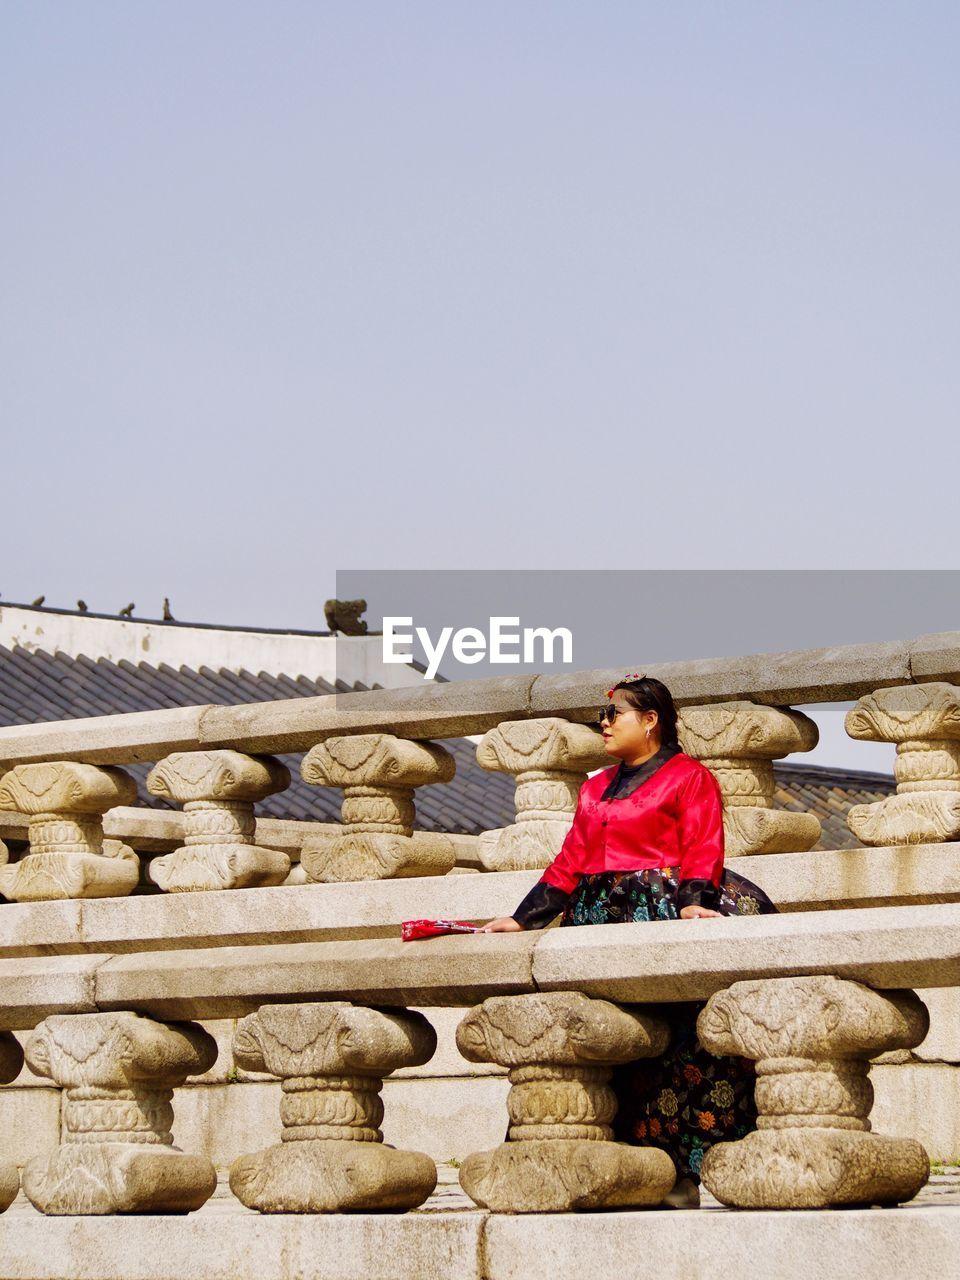 WOMAN SITTING AGAINST BUILT STRUCTURE